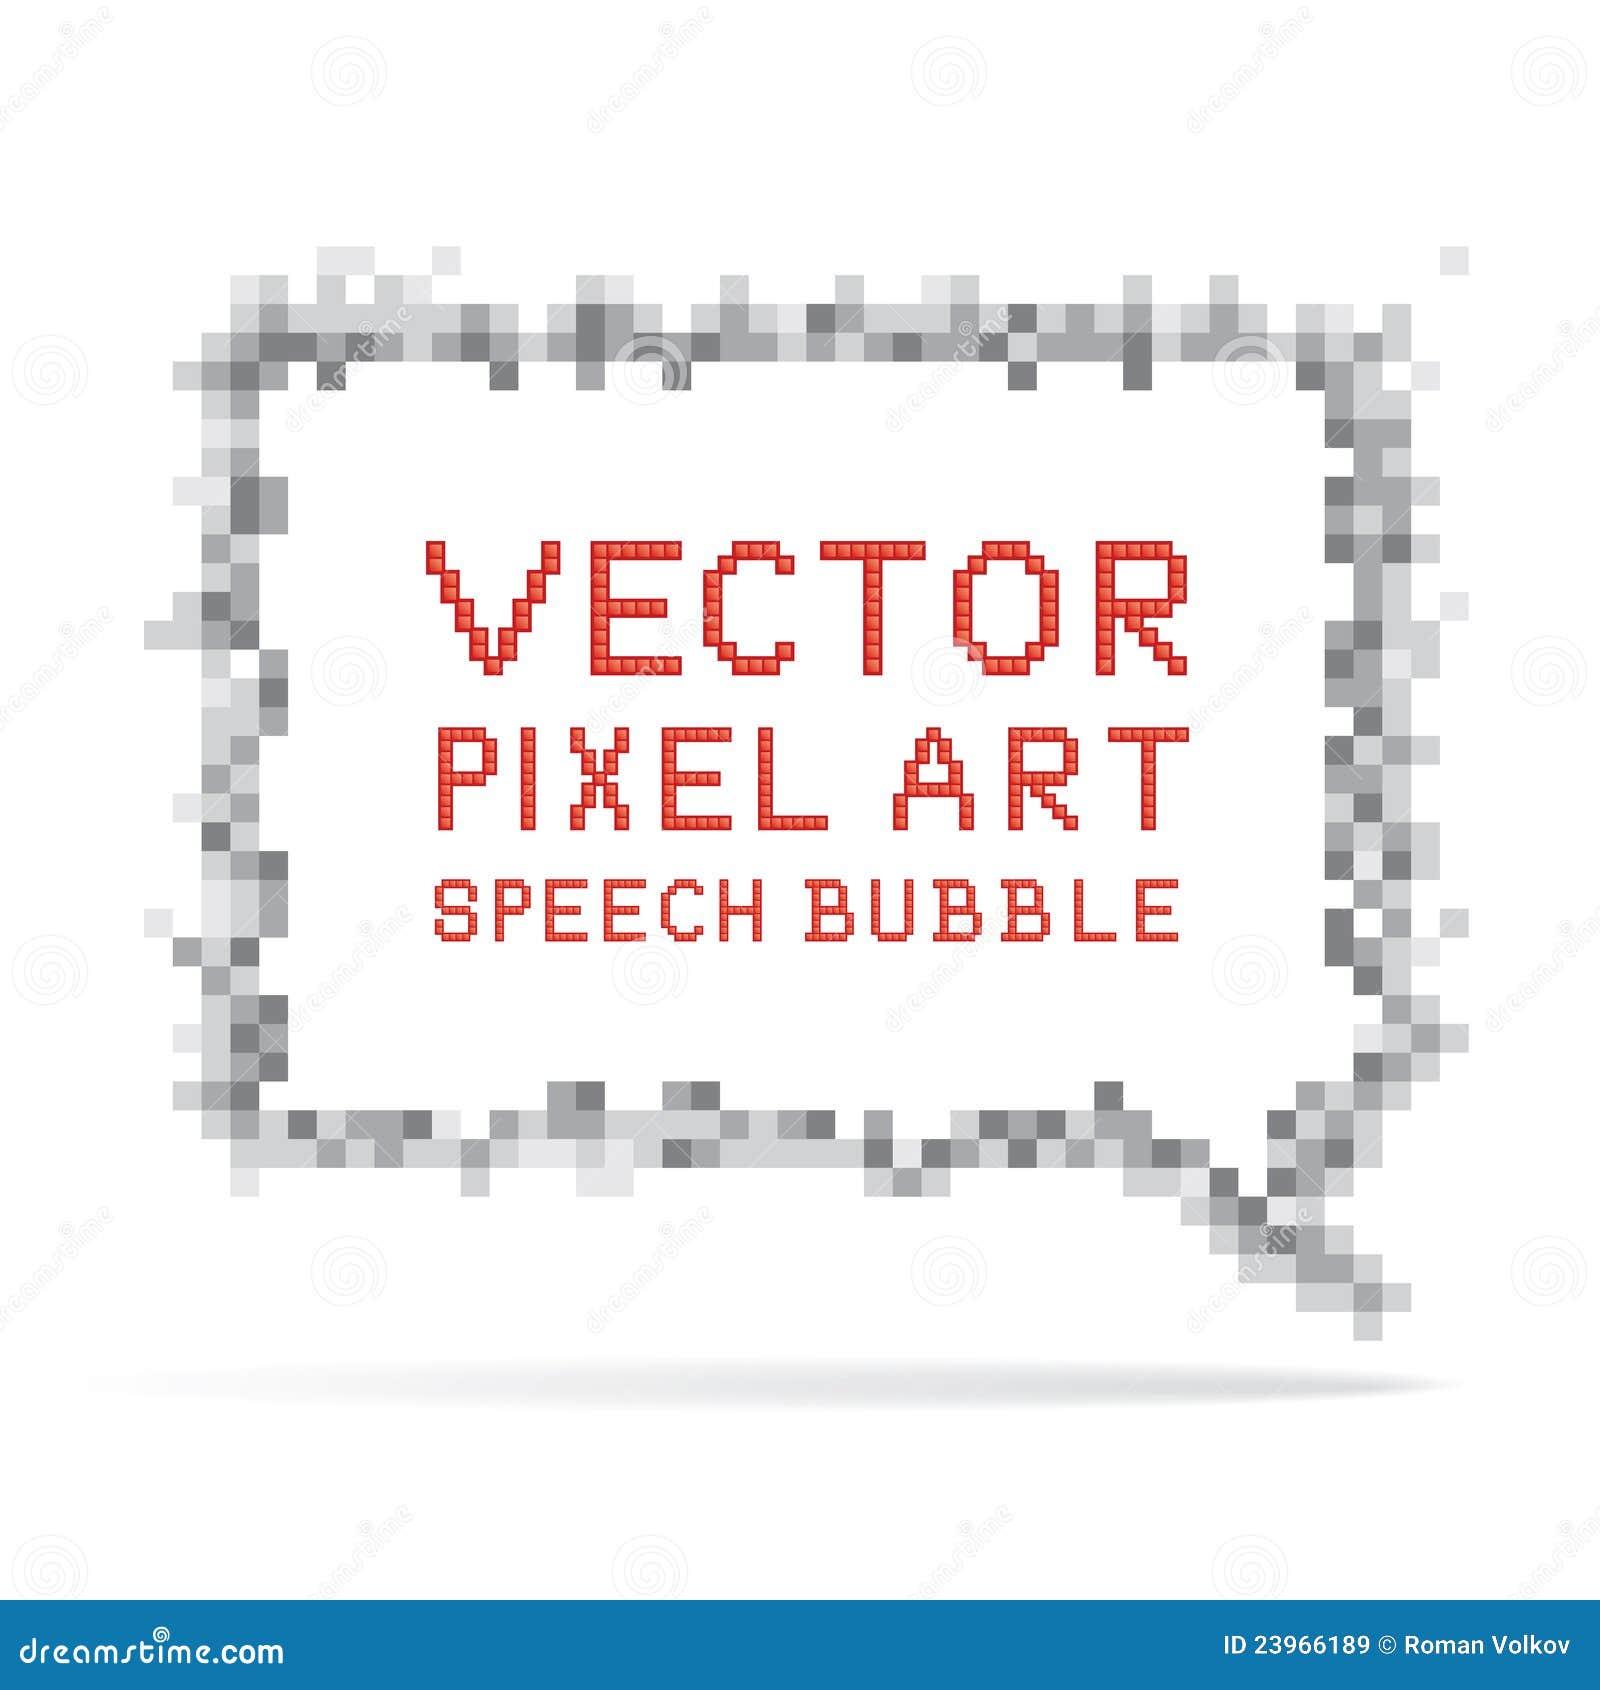 Square Speech Bubble In Pixel Art Style Royalty Free Stock